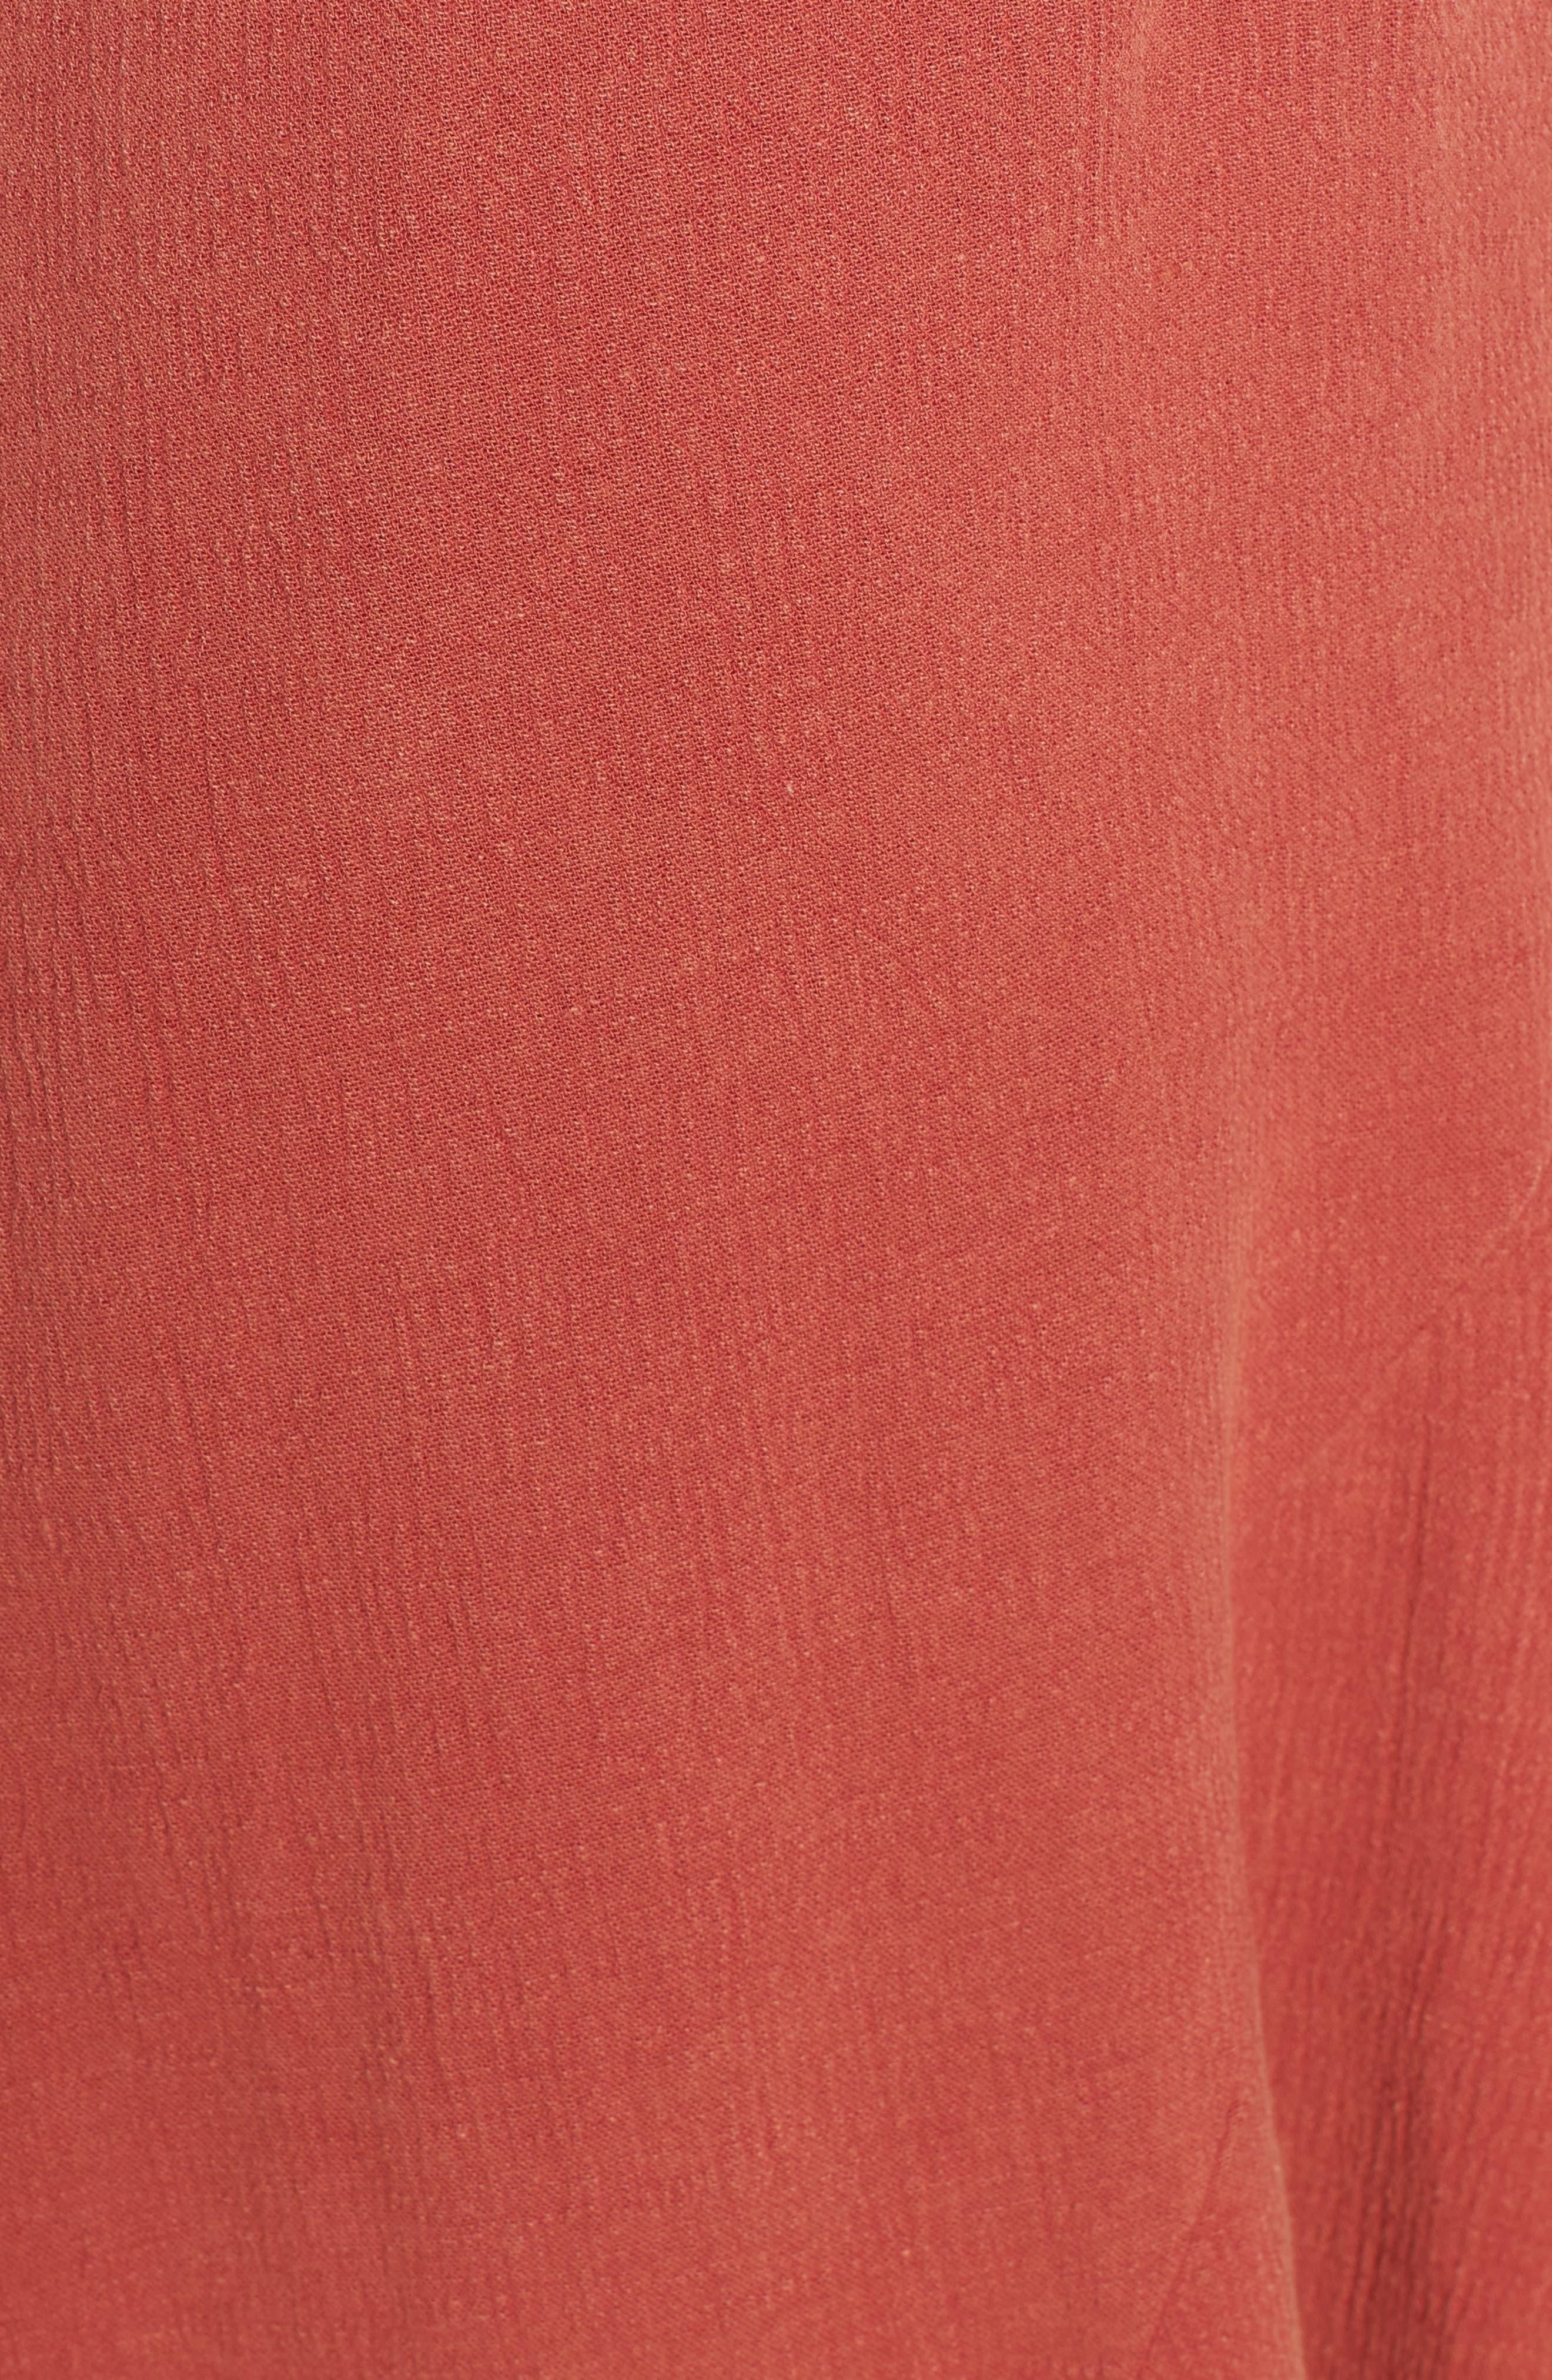 Meet Me in Dreams Flutter Hem Dress,                             Alternate thumbnail 6, color,                             Burnt Orange